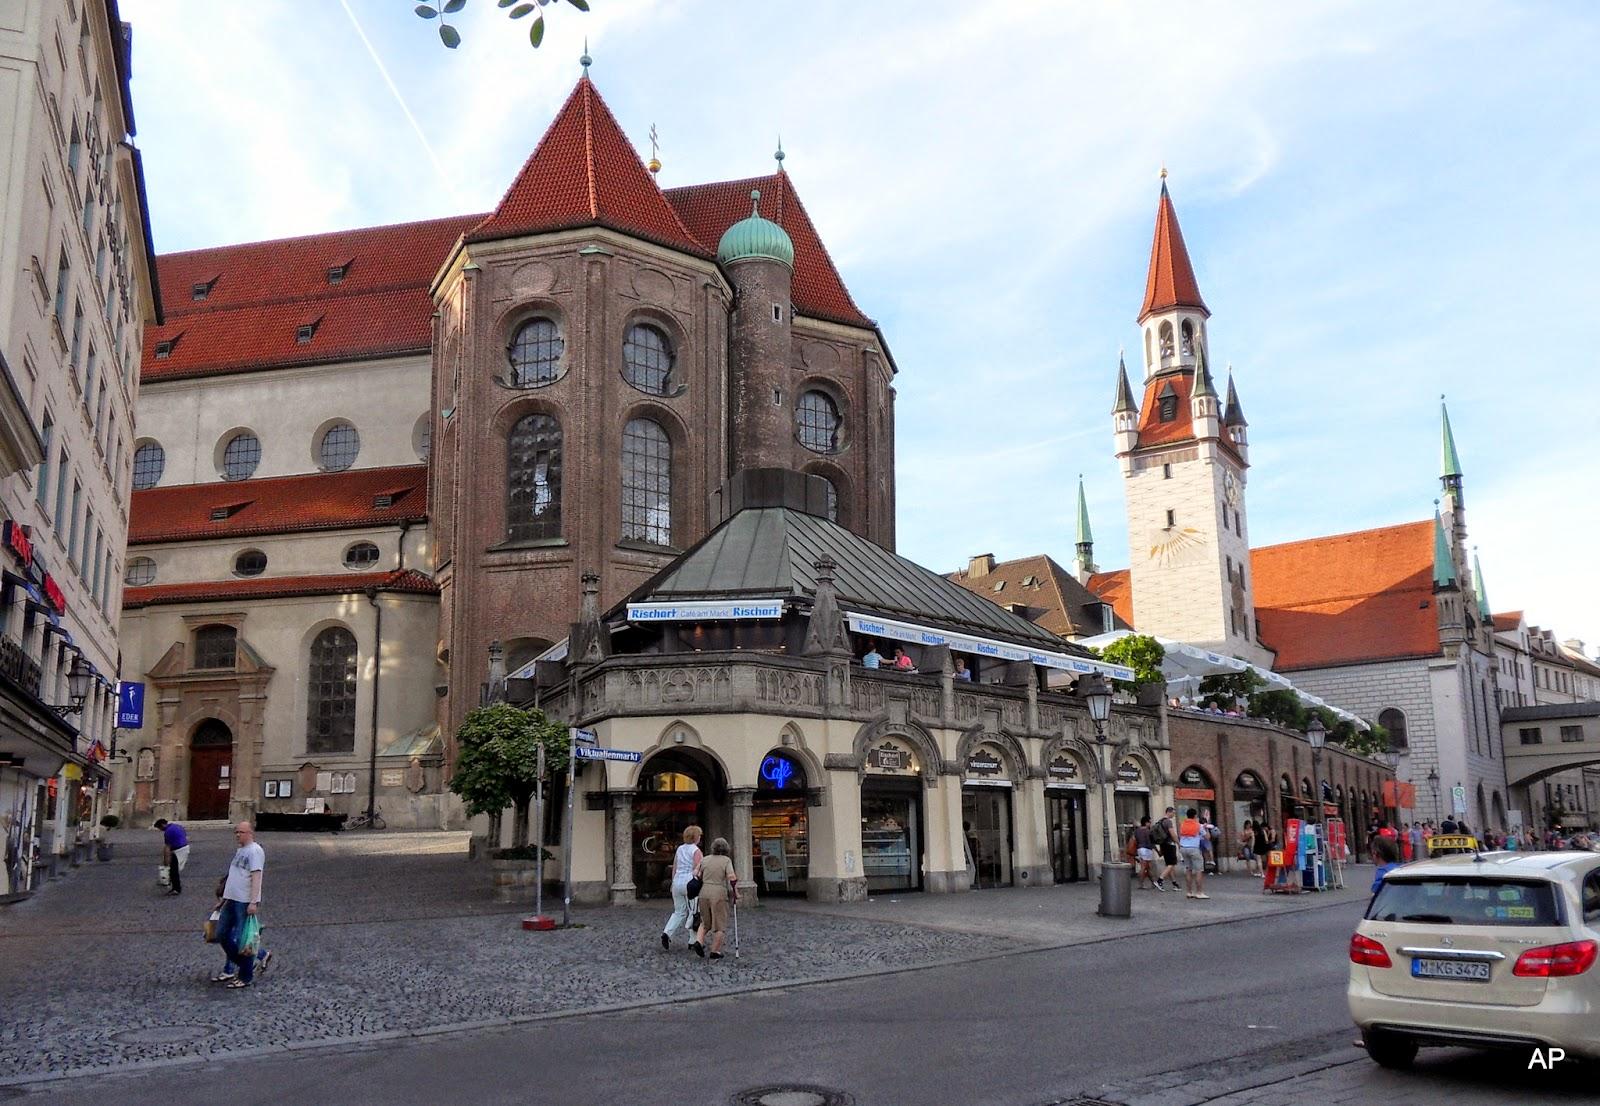 St. Peterskirche.